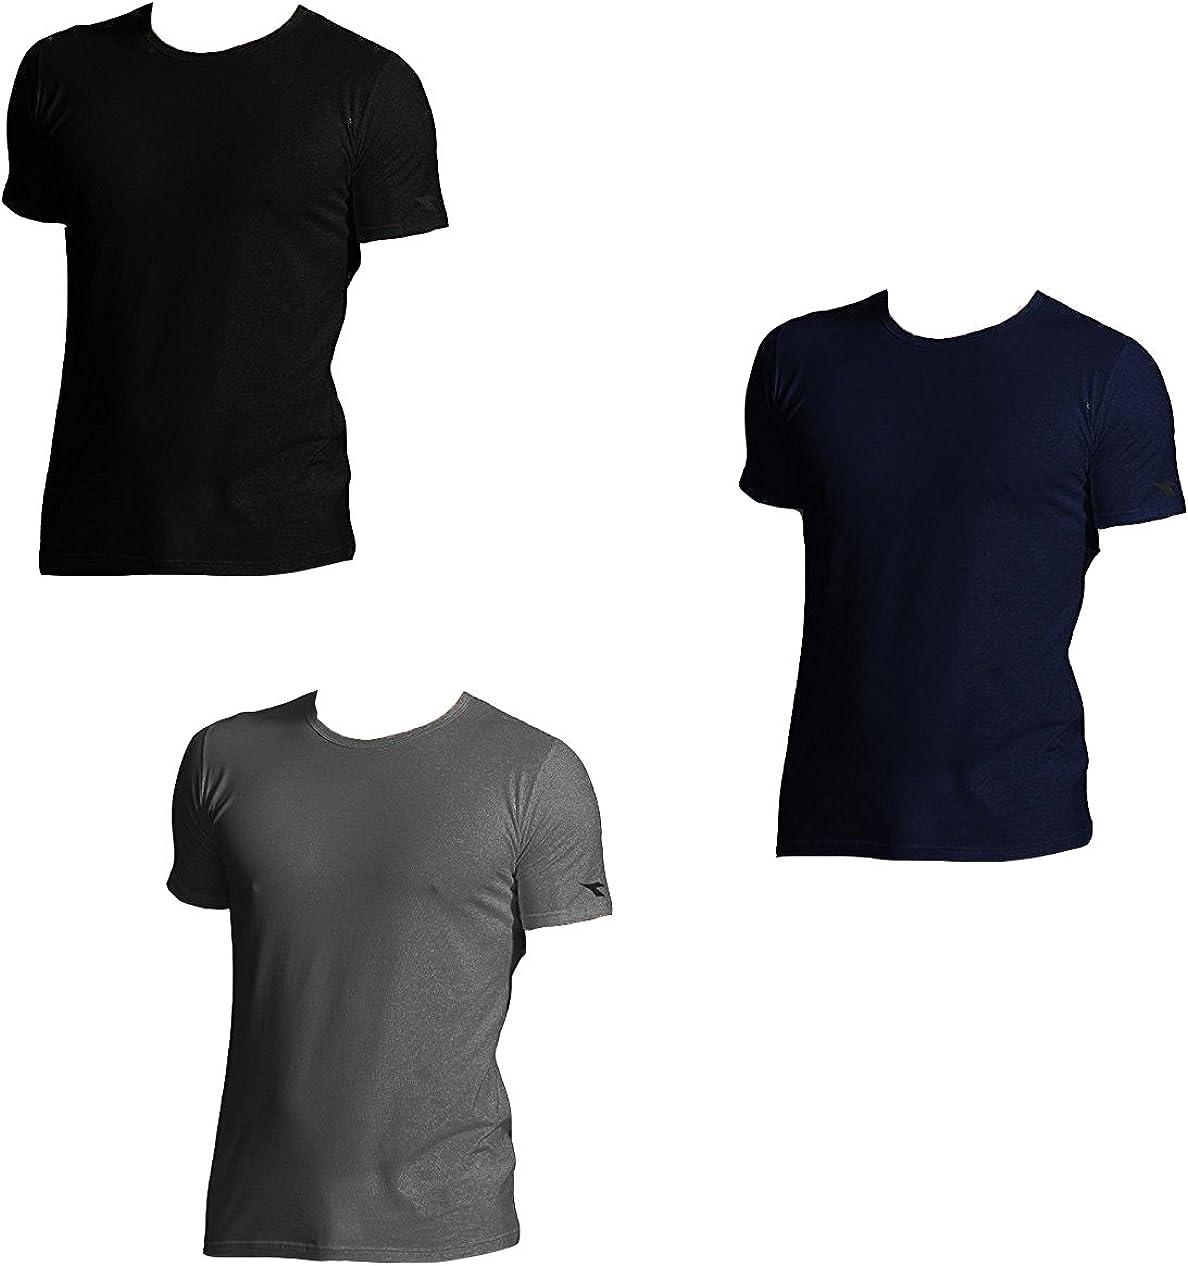 Diadora 3 t-Shirt Uomo Mezza Manica Puro Cotone Girocollo Underwear Art 6067